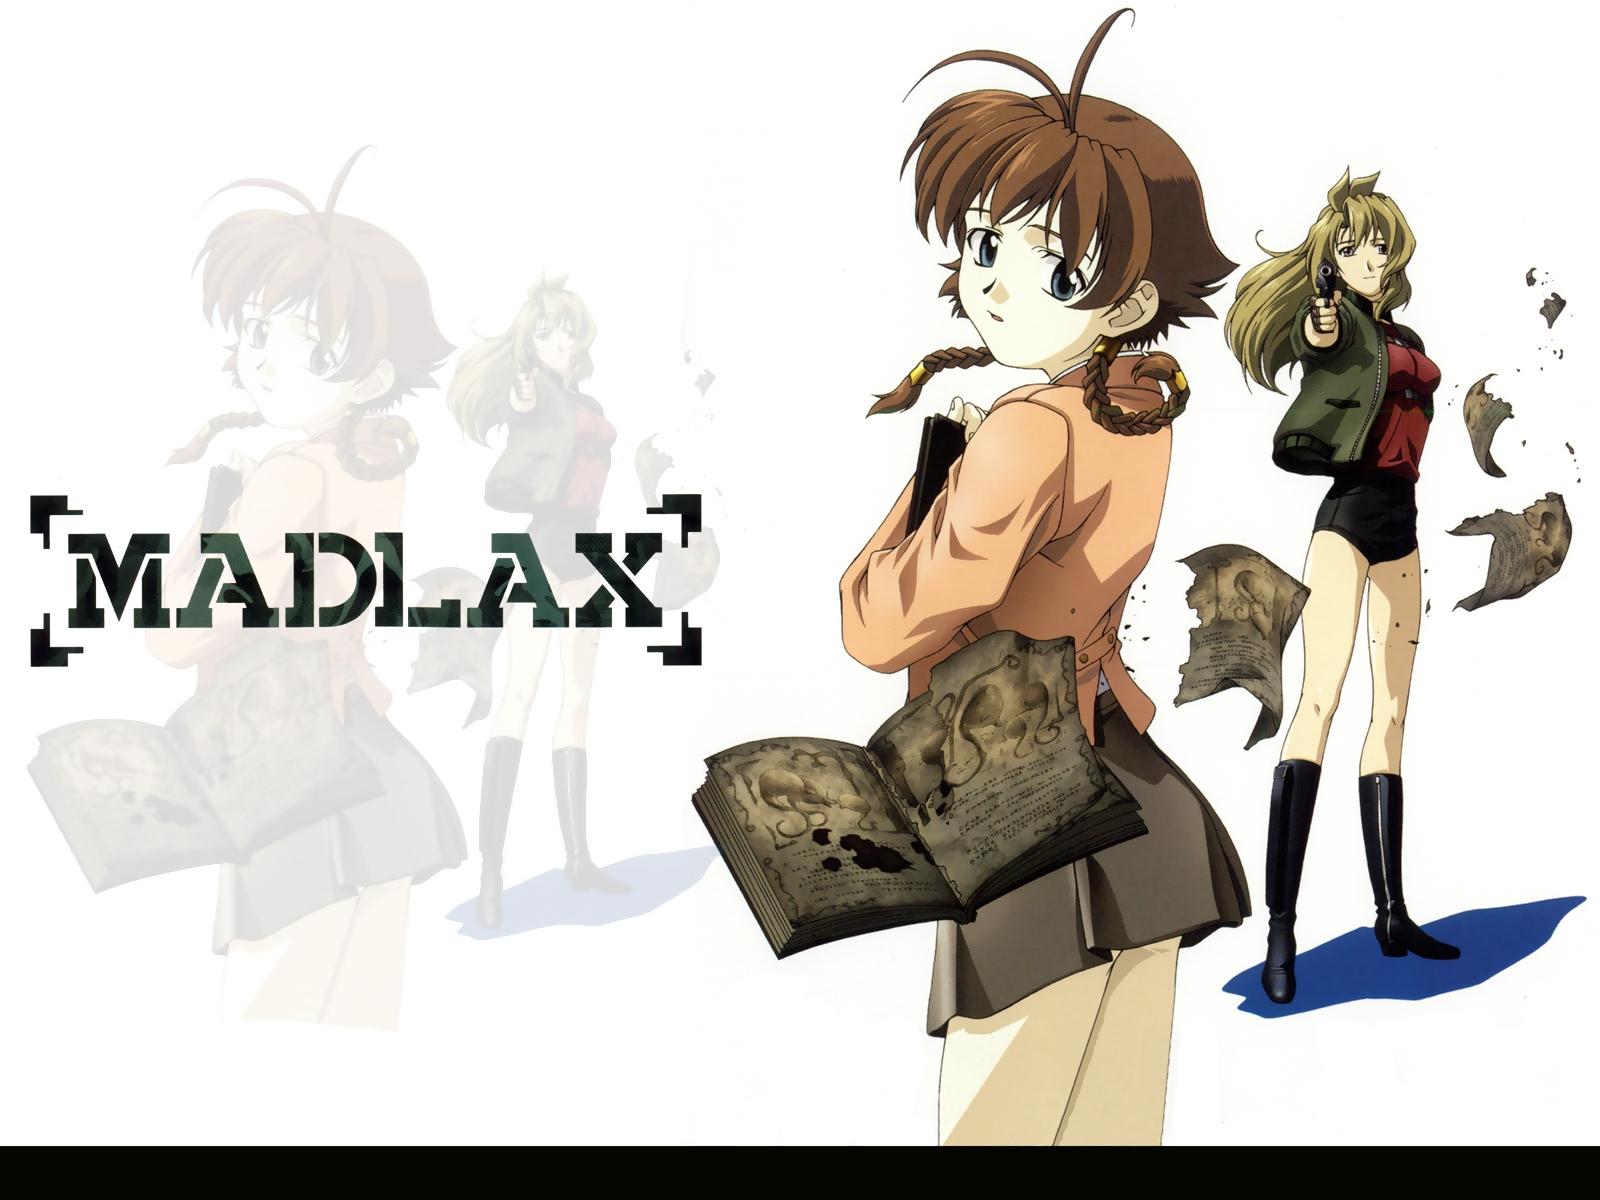 madlax-nowhere.jpg